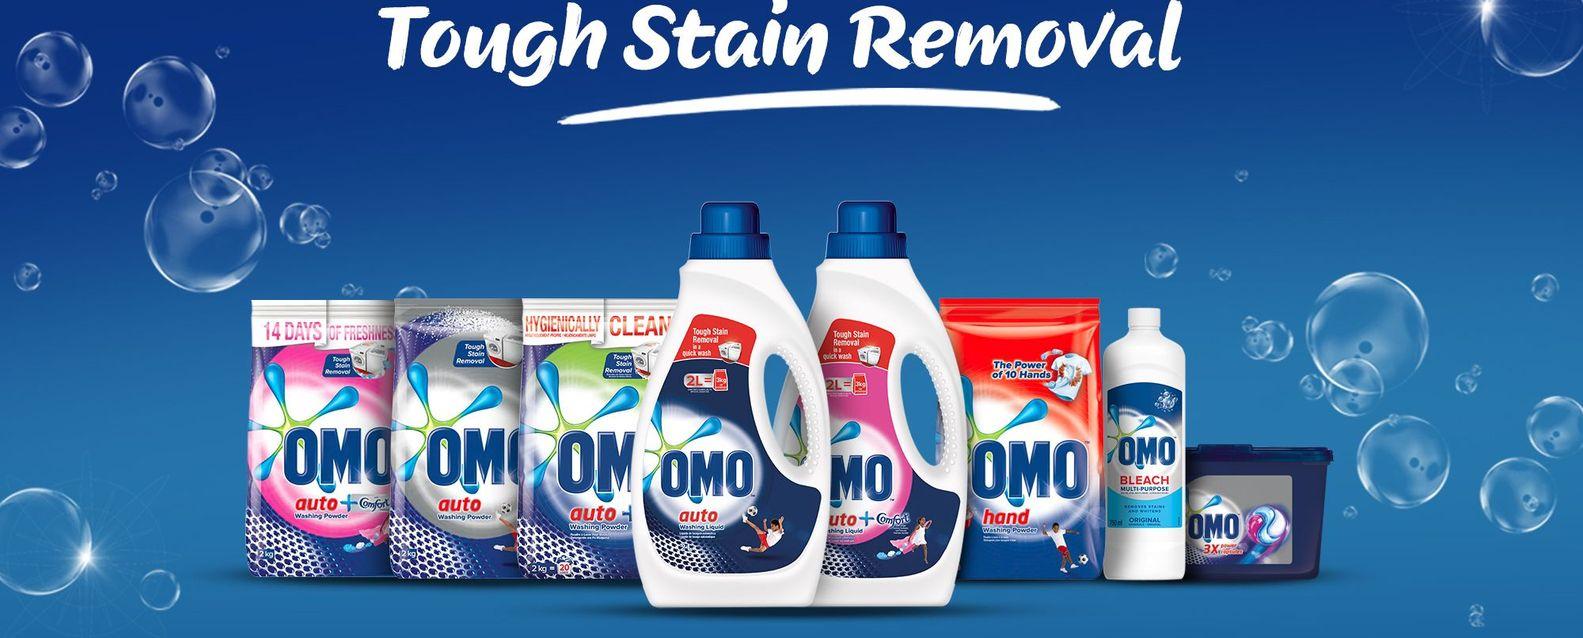 Omo banner